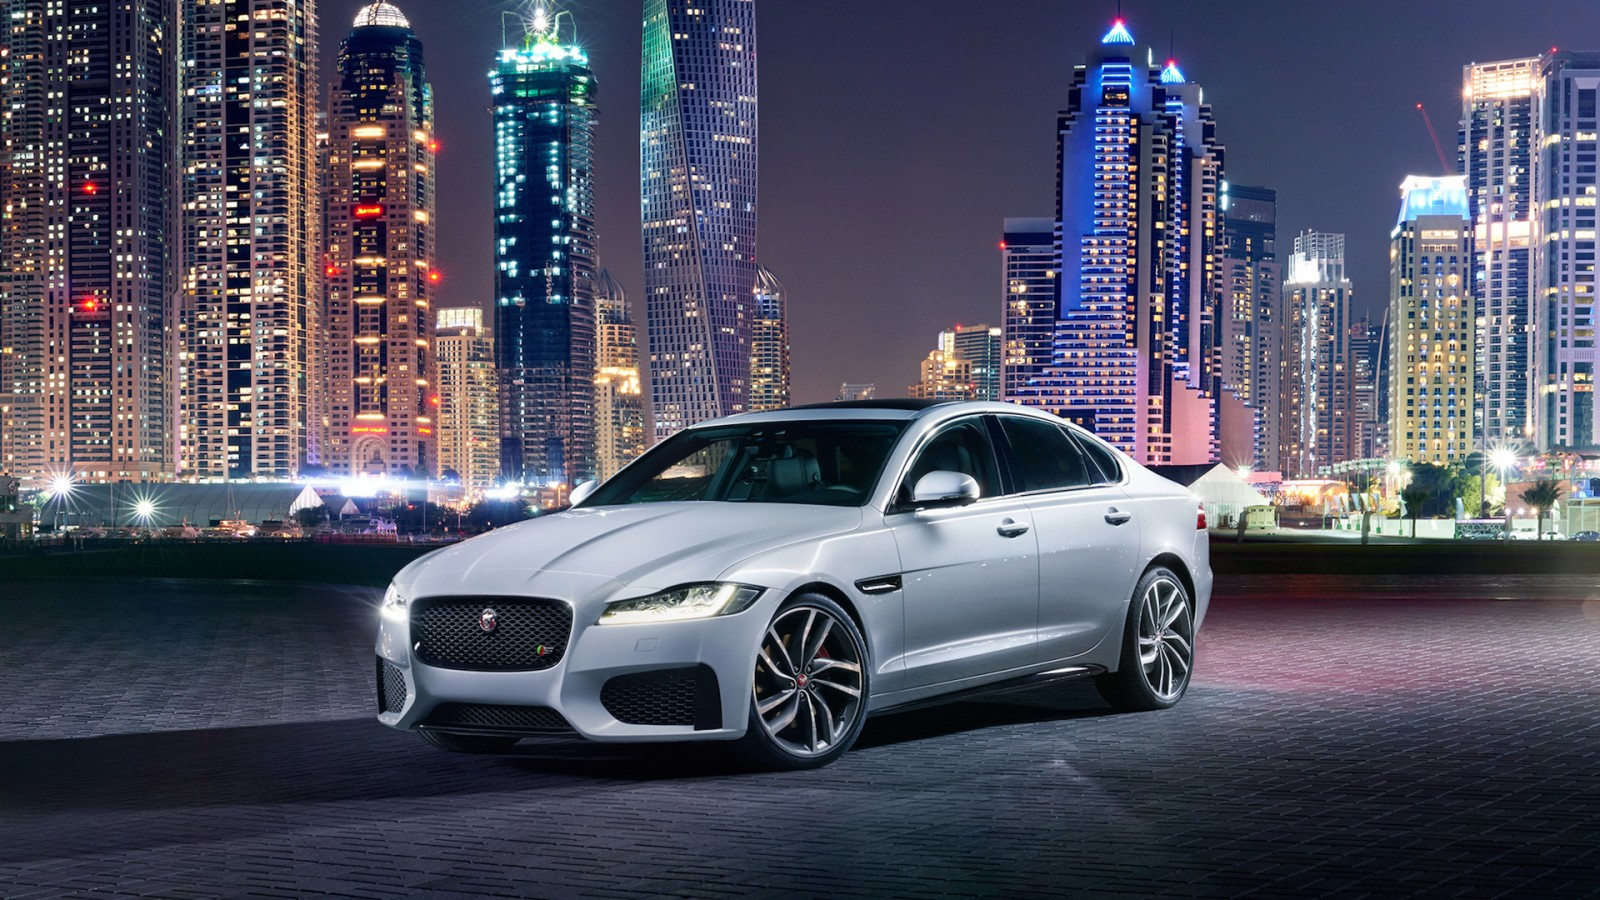 2016 Jaguar XF Wallpaper | HD Car Wallpapers | ID #5229